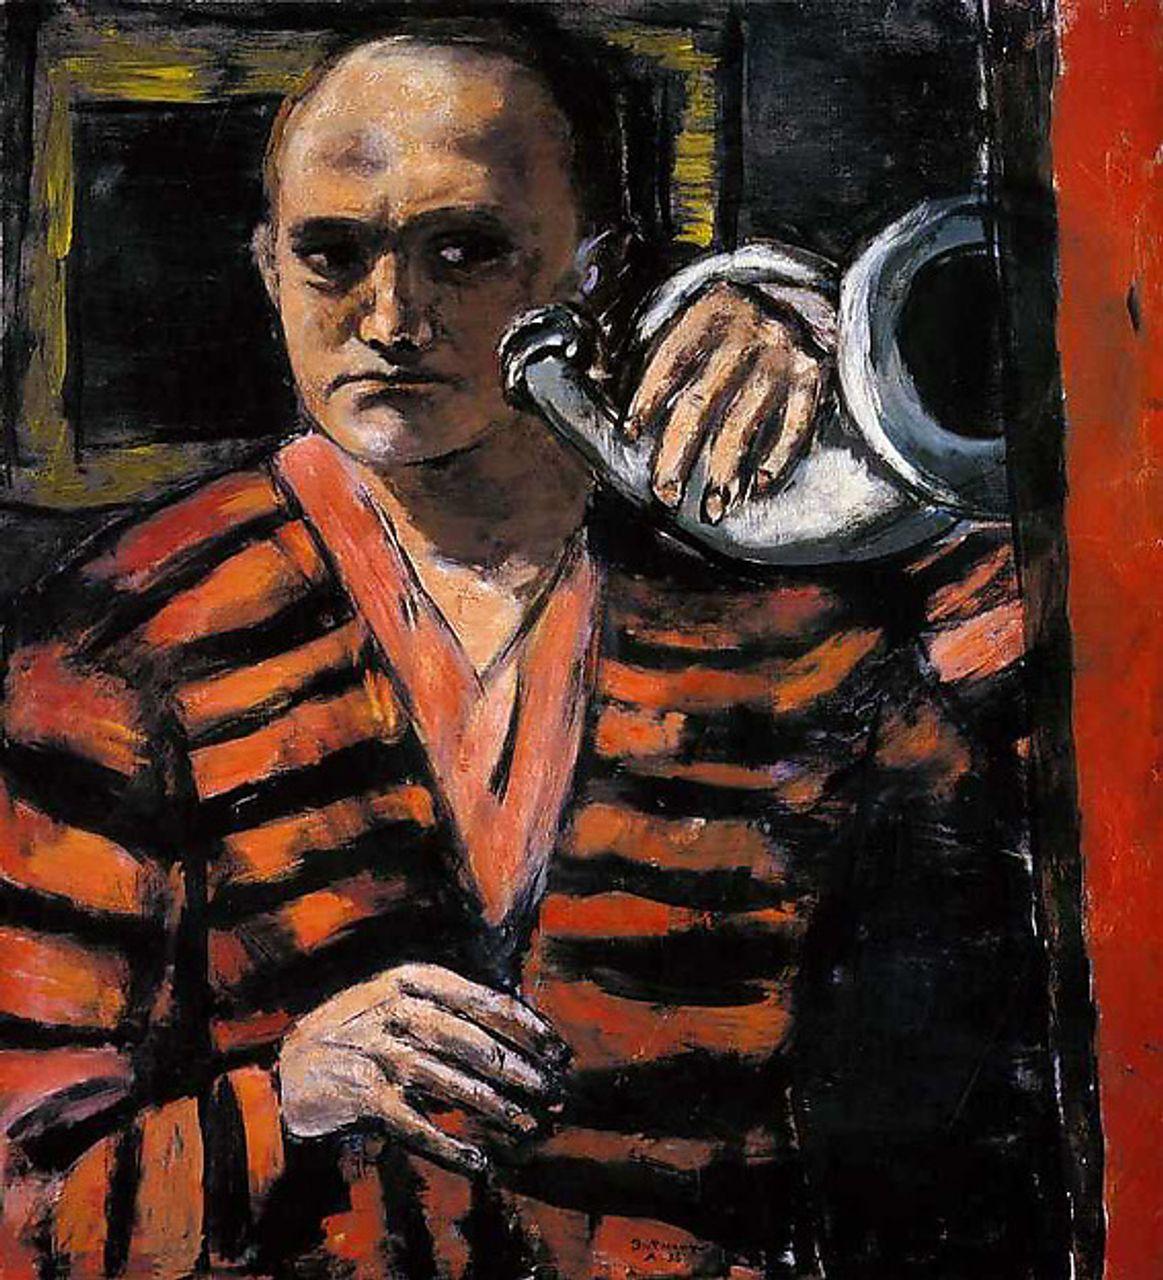 Max Beckmann, Self-Portrait with Horn (1938)